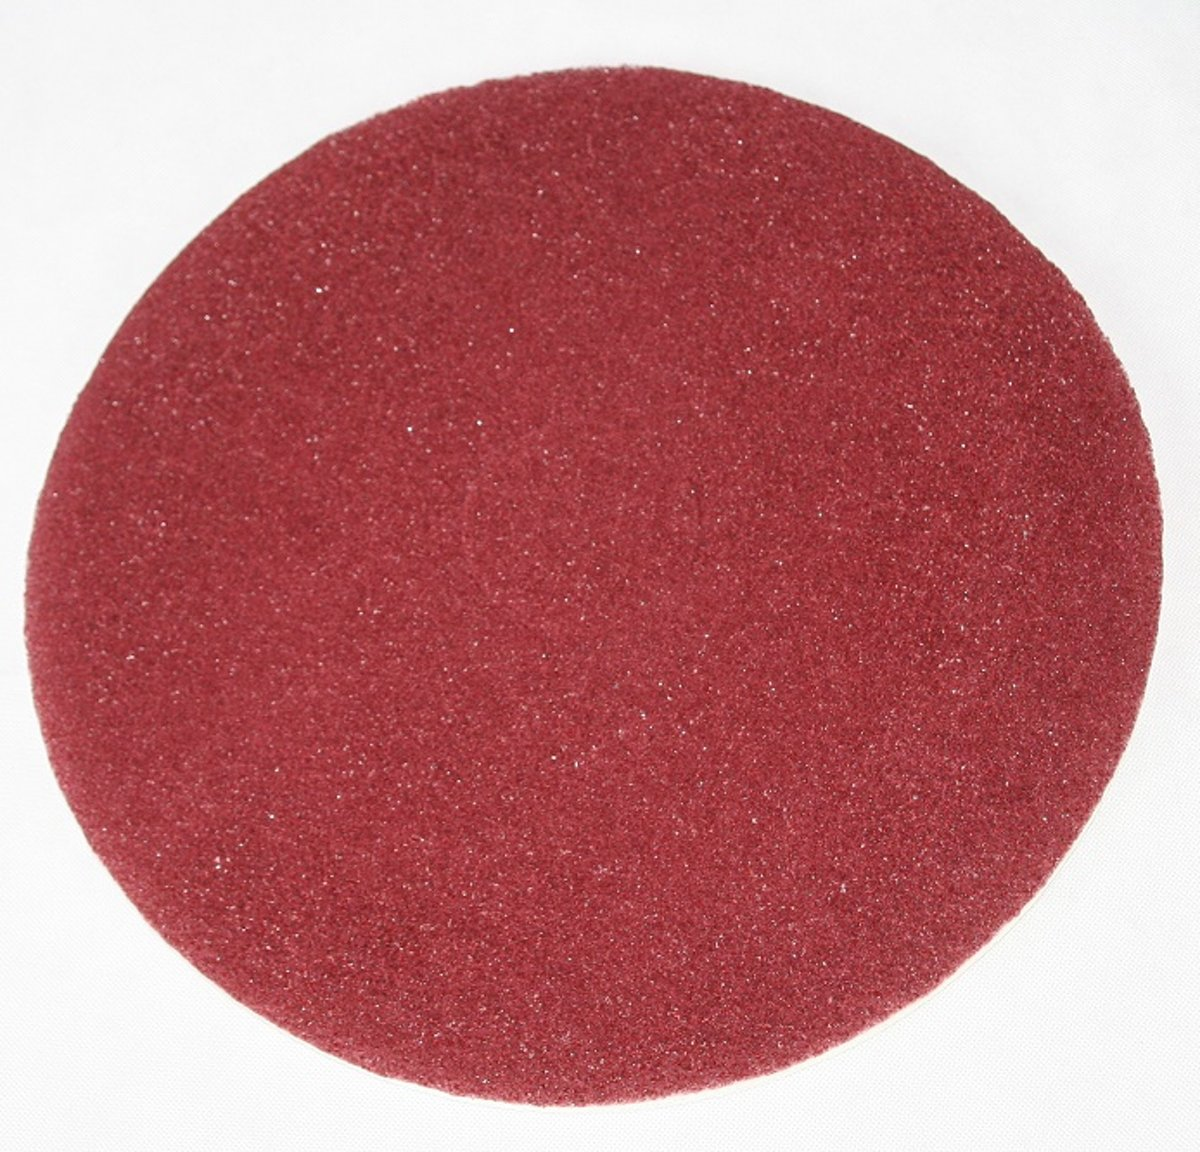 Diamantpads 42.5 cm, 2 cm, 17 inch rood kopen